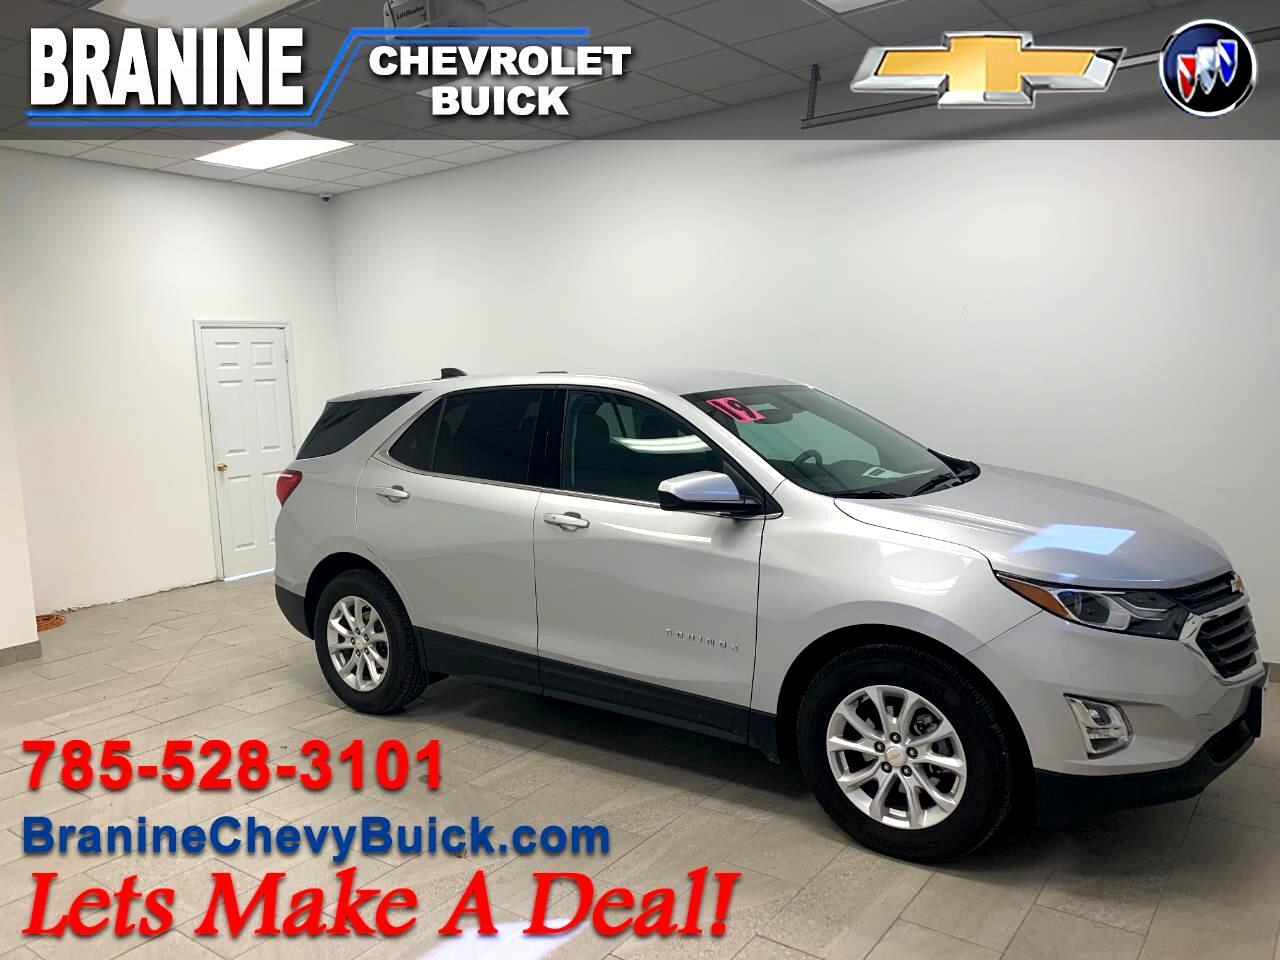 Chevrolet Equinox FWD 4dr LT w/1LT 2019